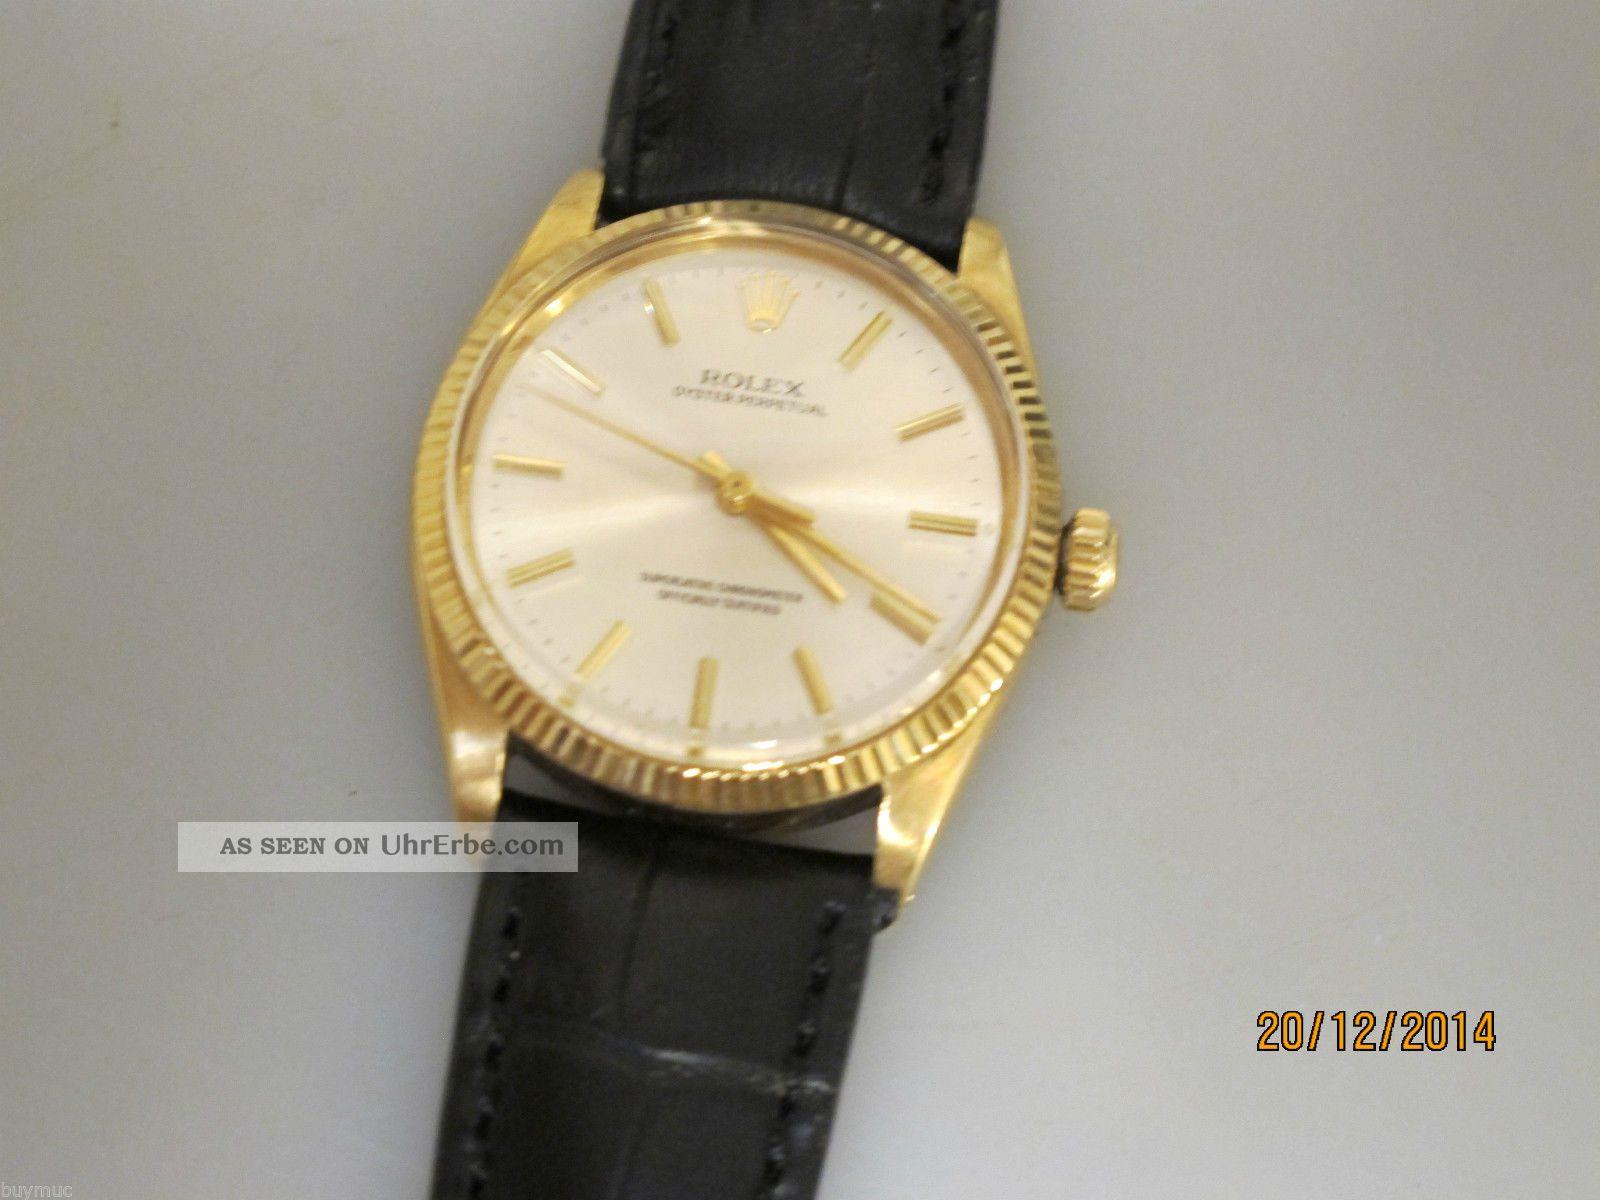 Vintage Rolex Oyster Perpetual Chronometer In 18k Gold 36mm Uhrmachermeister Armbanduhren Bild